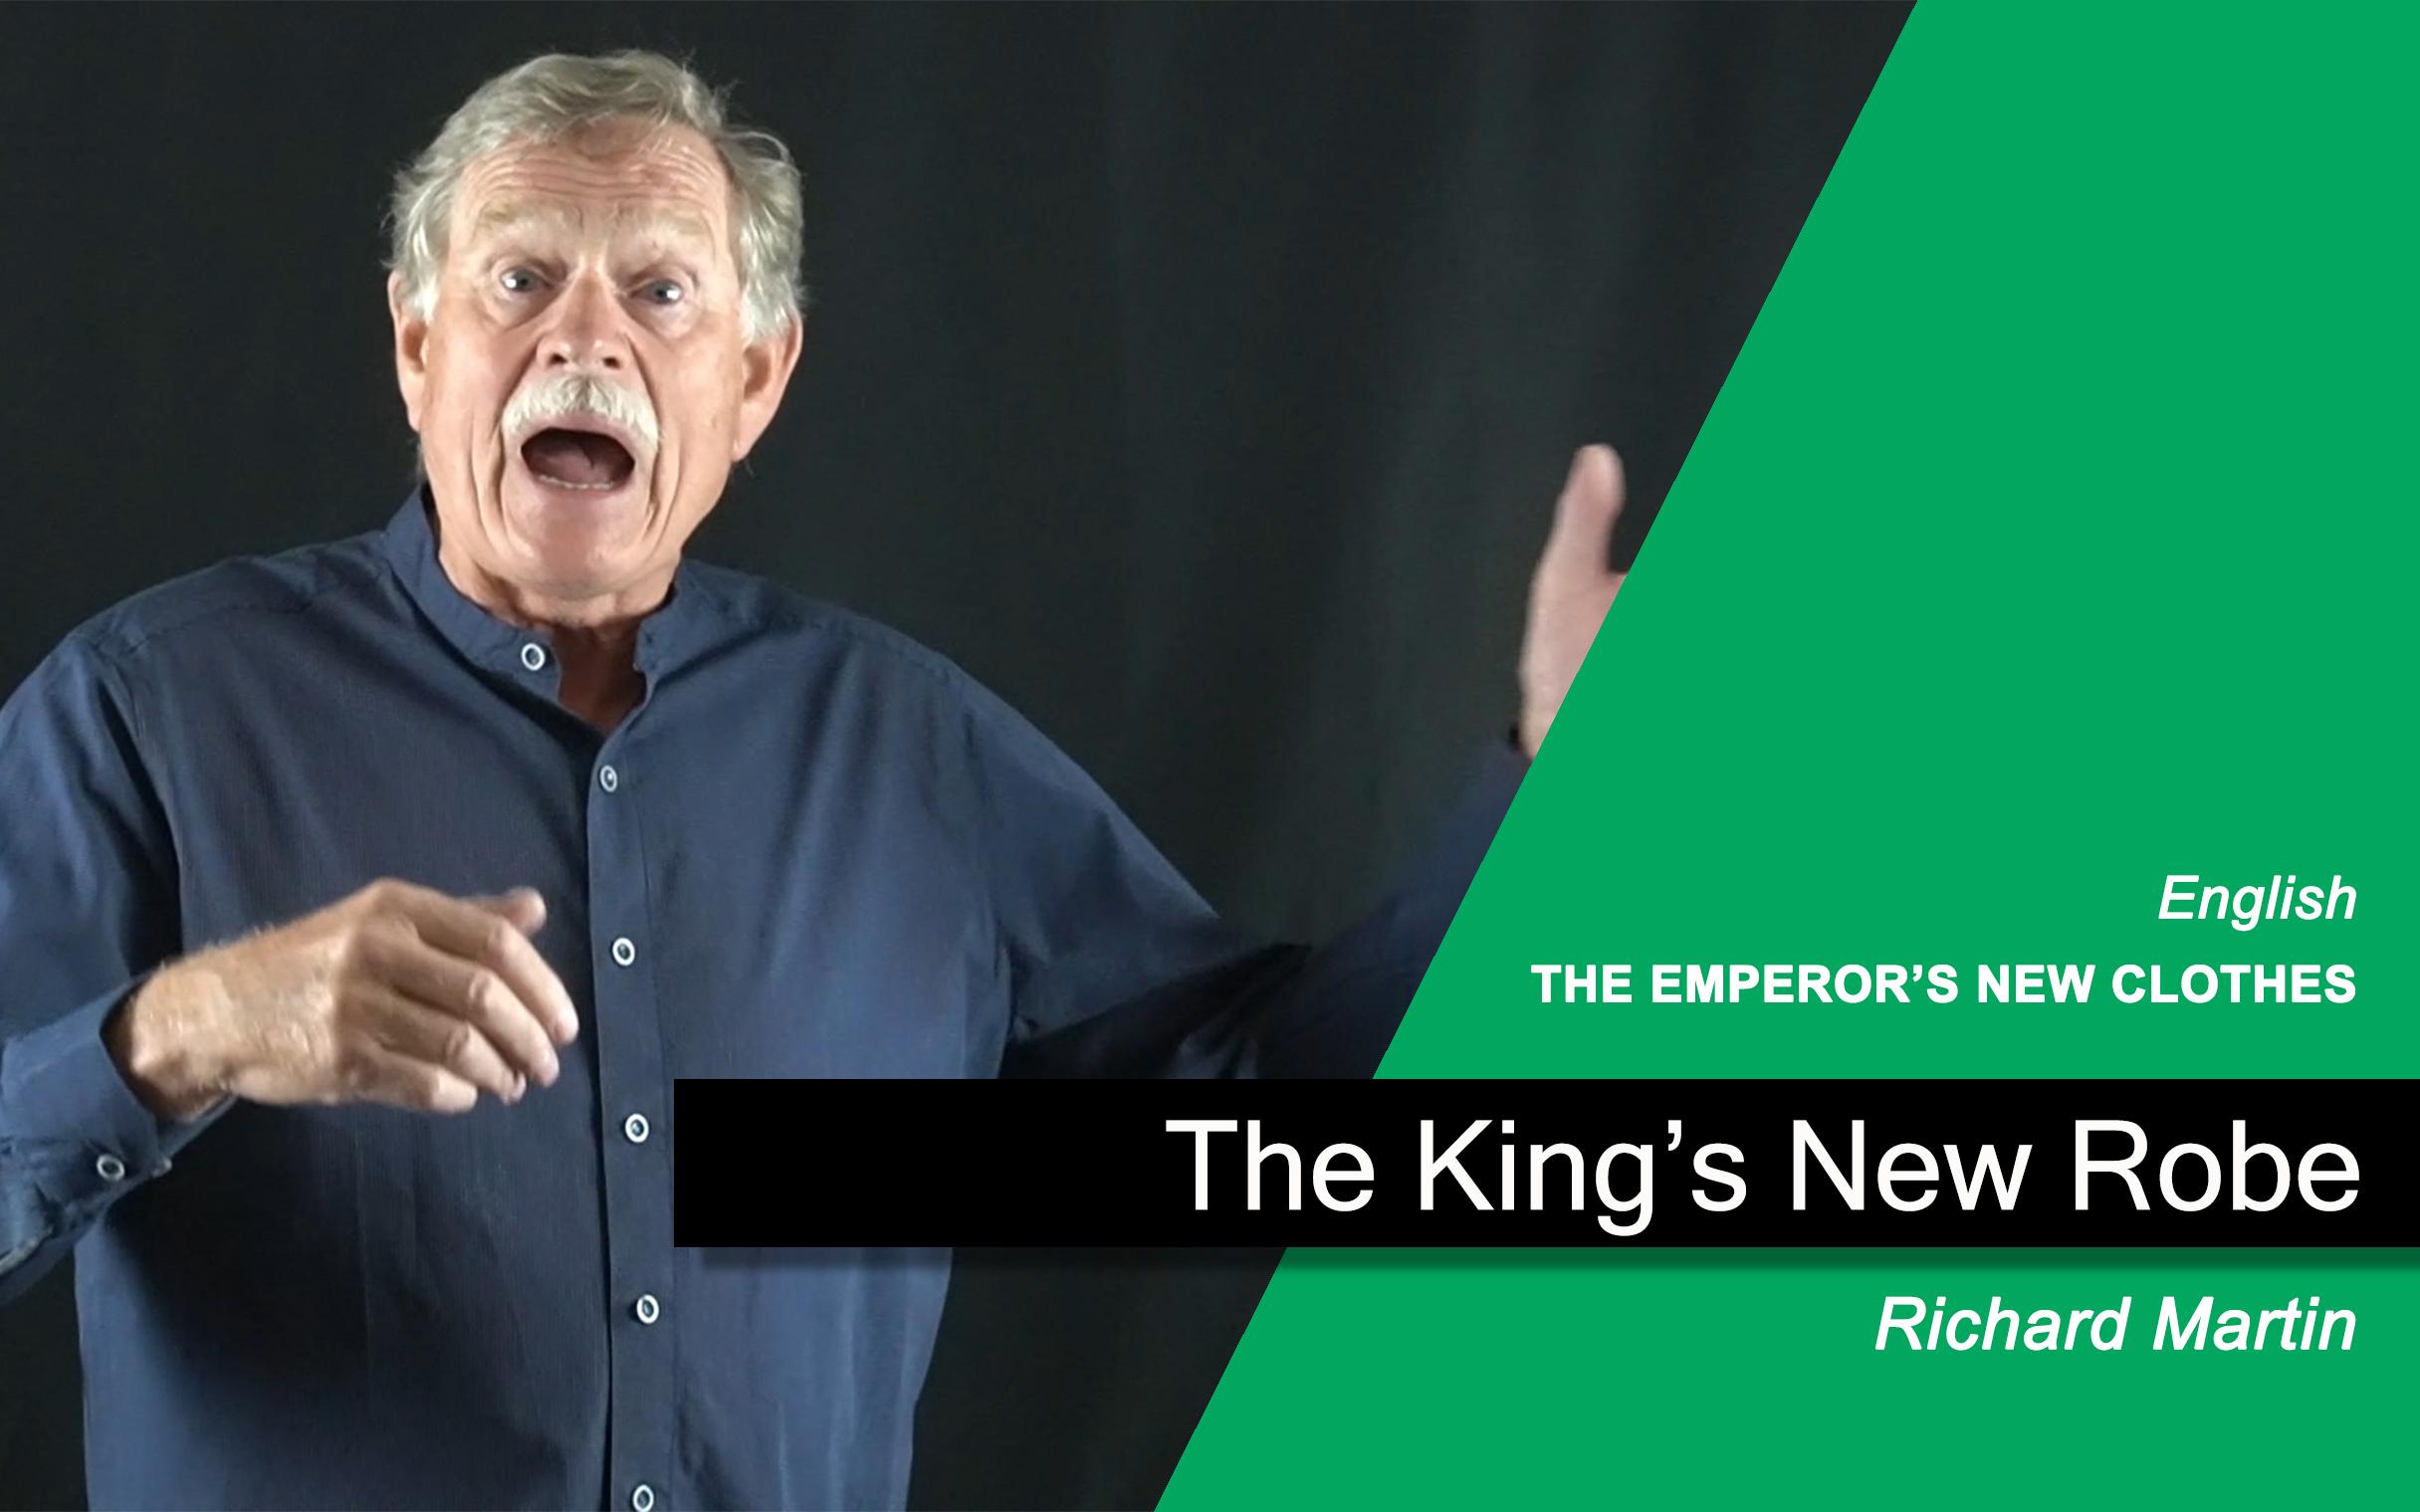 King's New Robe